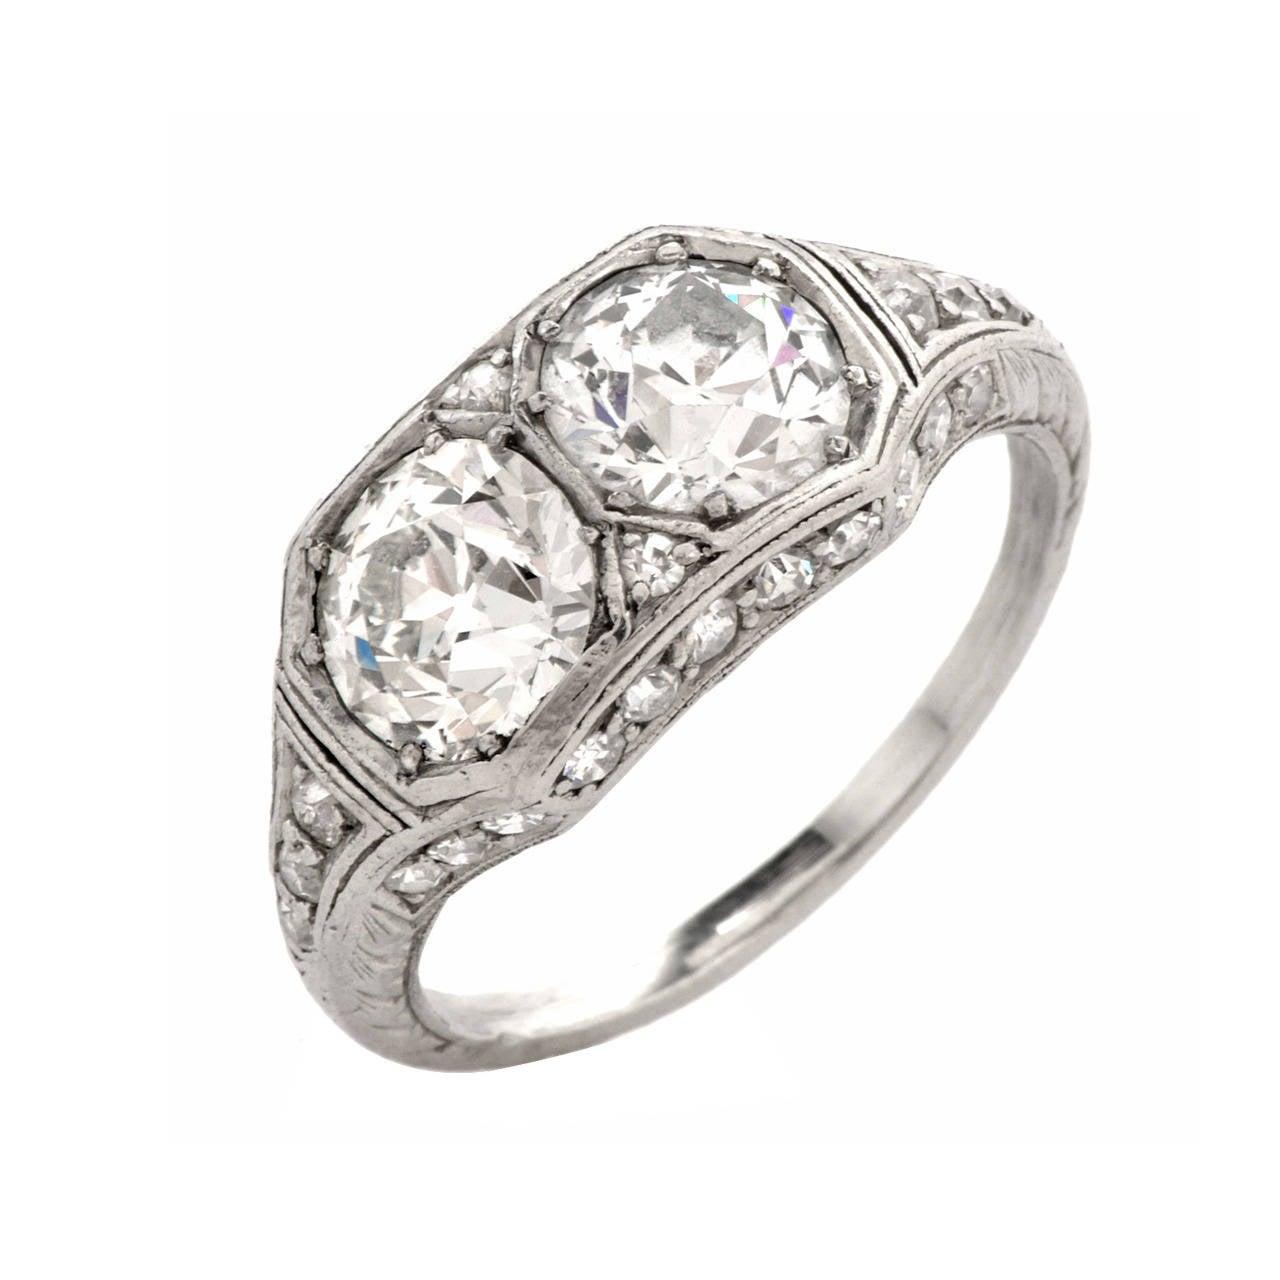 Antique Art Deco Double Diamond Platinum Engagement Ring at 1stdibs